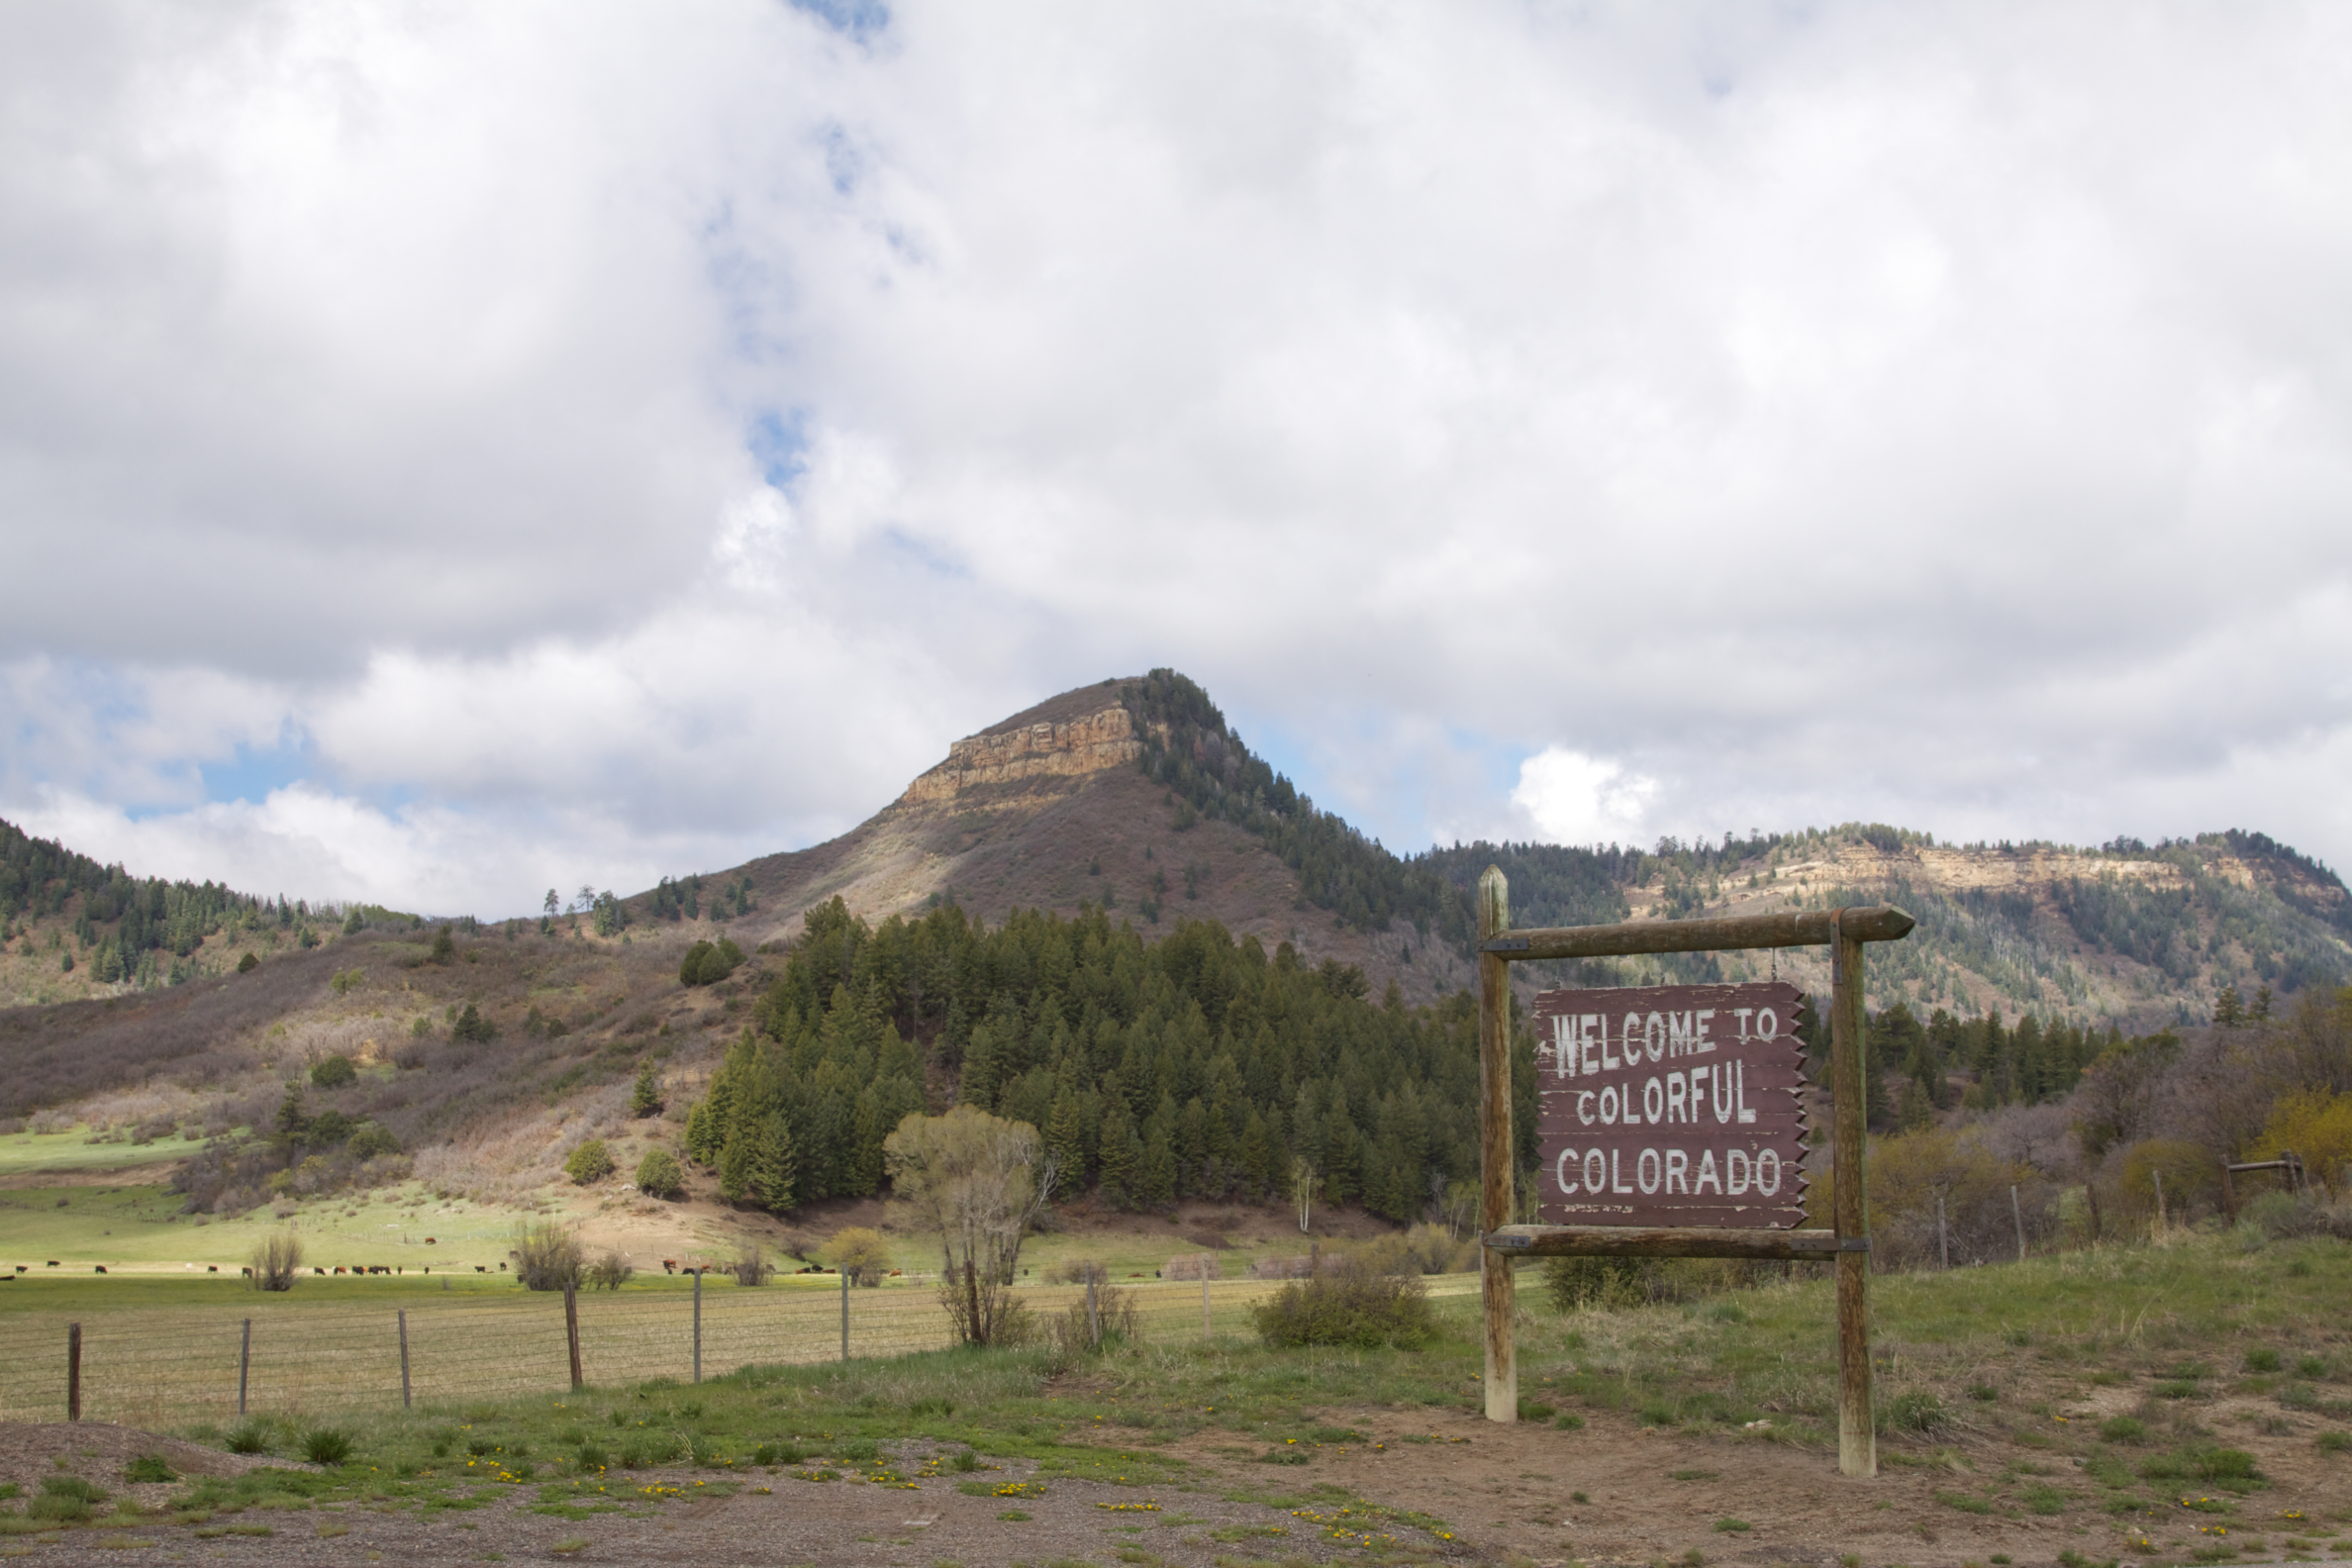 U.S. 84, Archuleta County